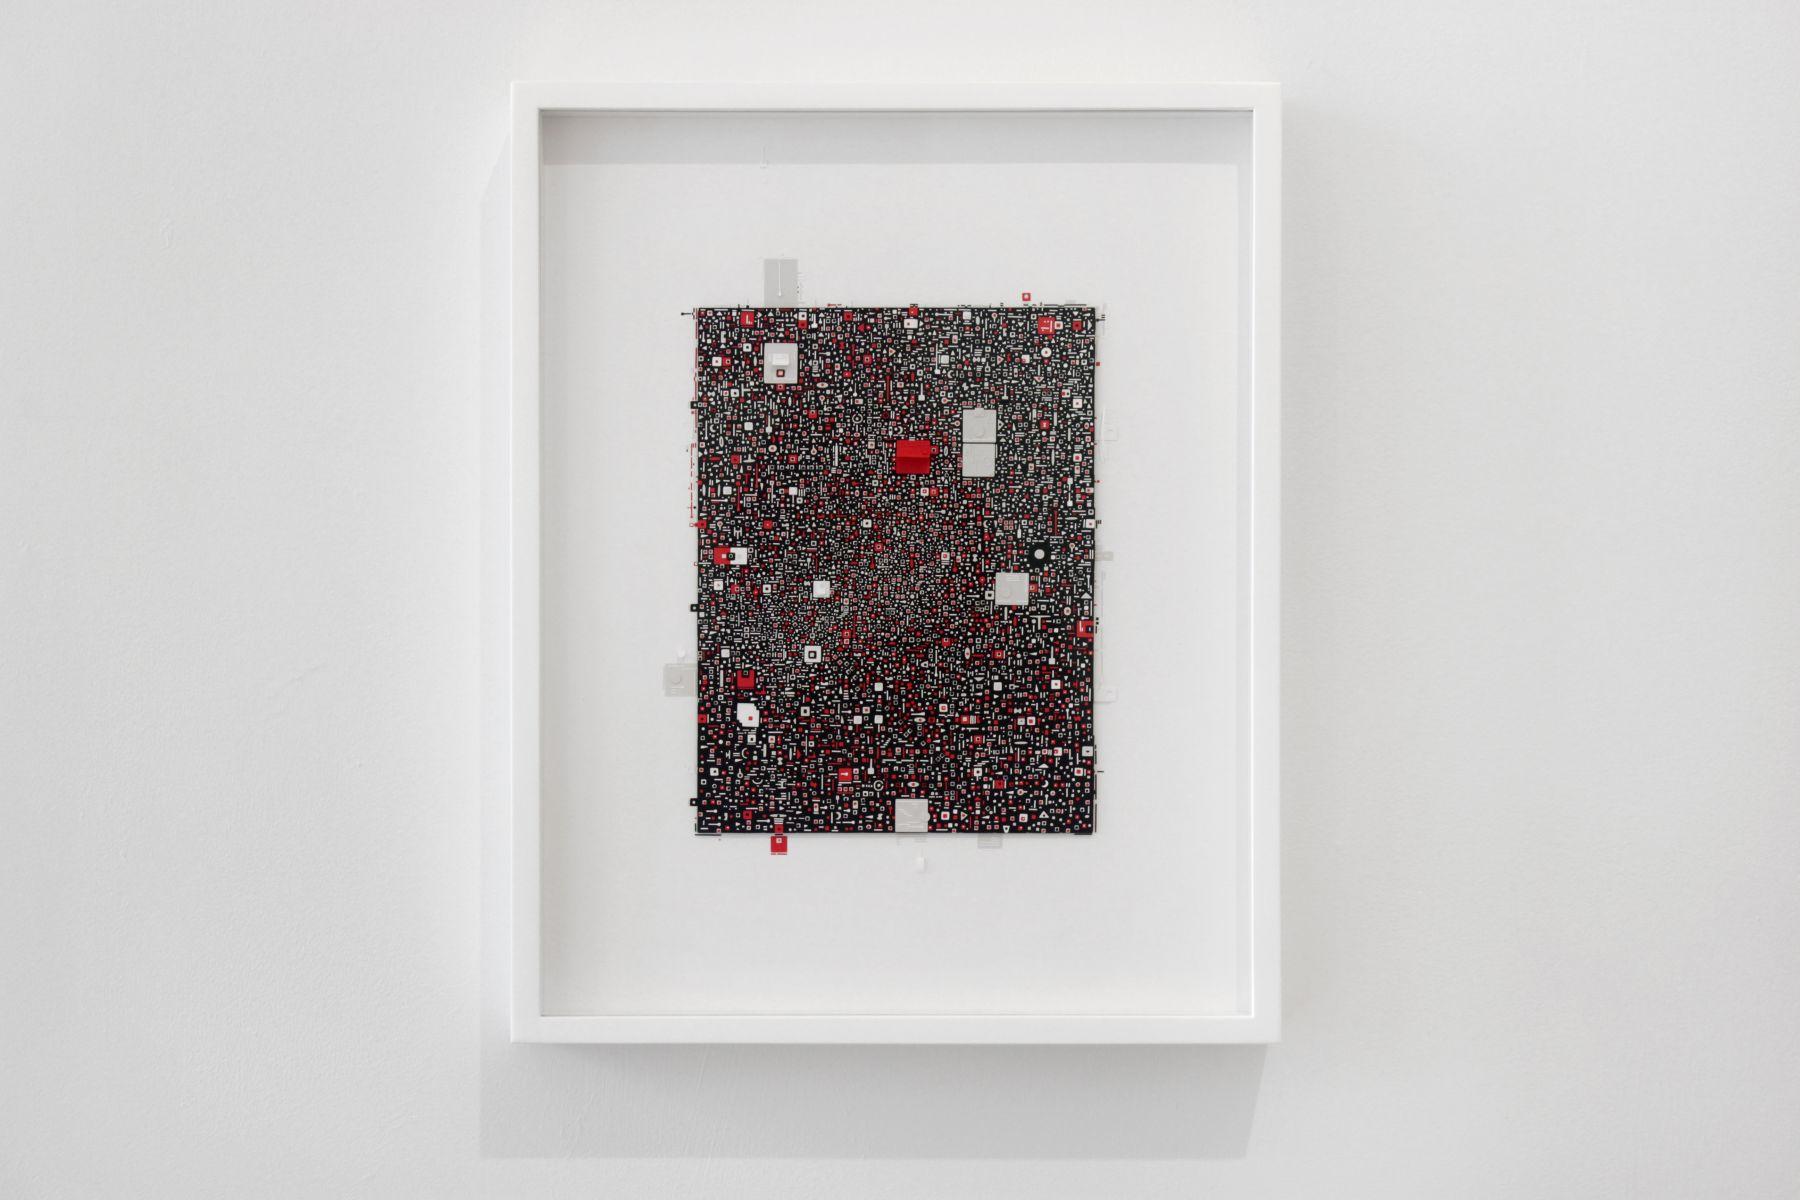 Marco Maggi, Label Lab (on Black), 2018